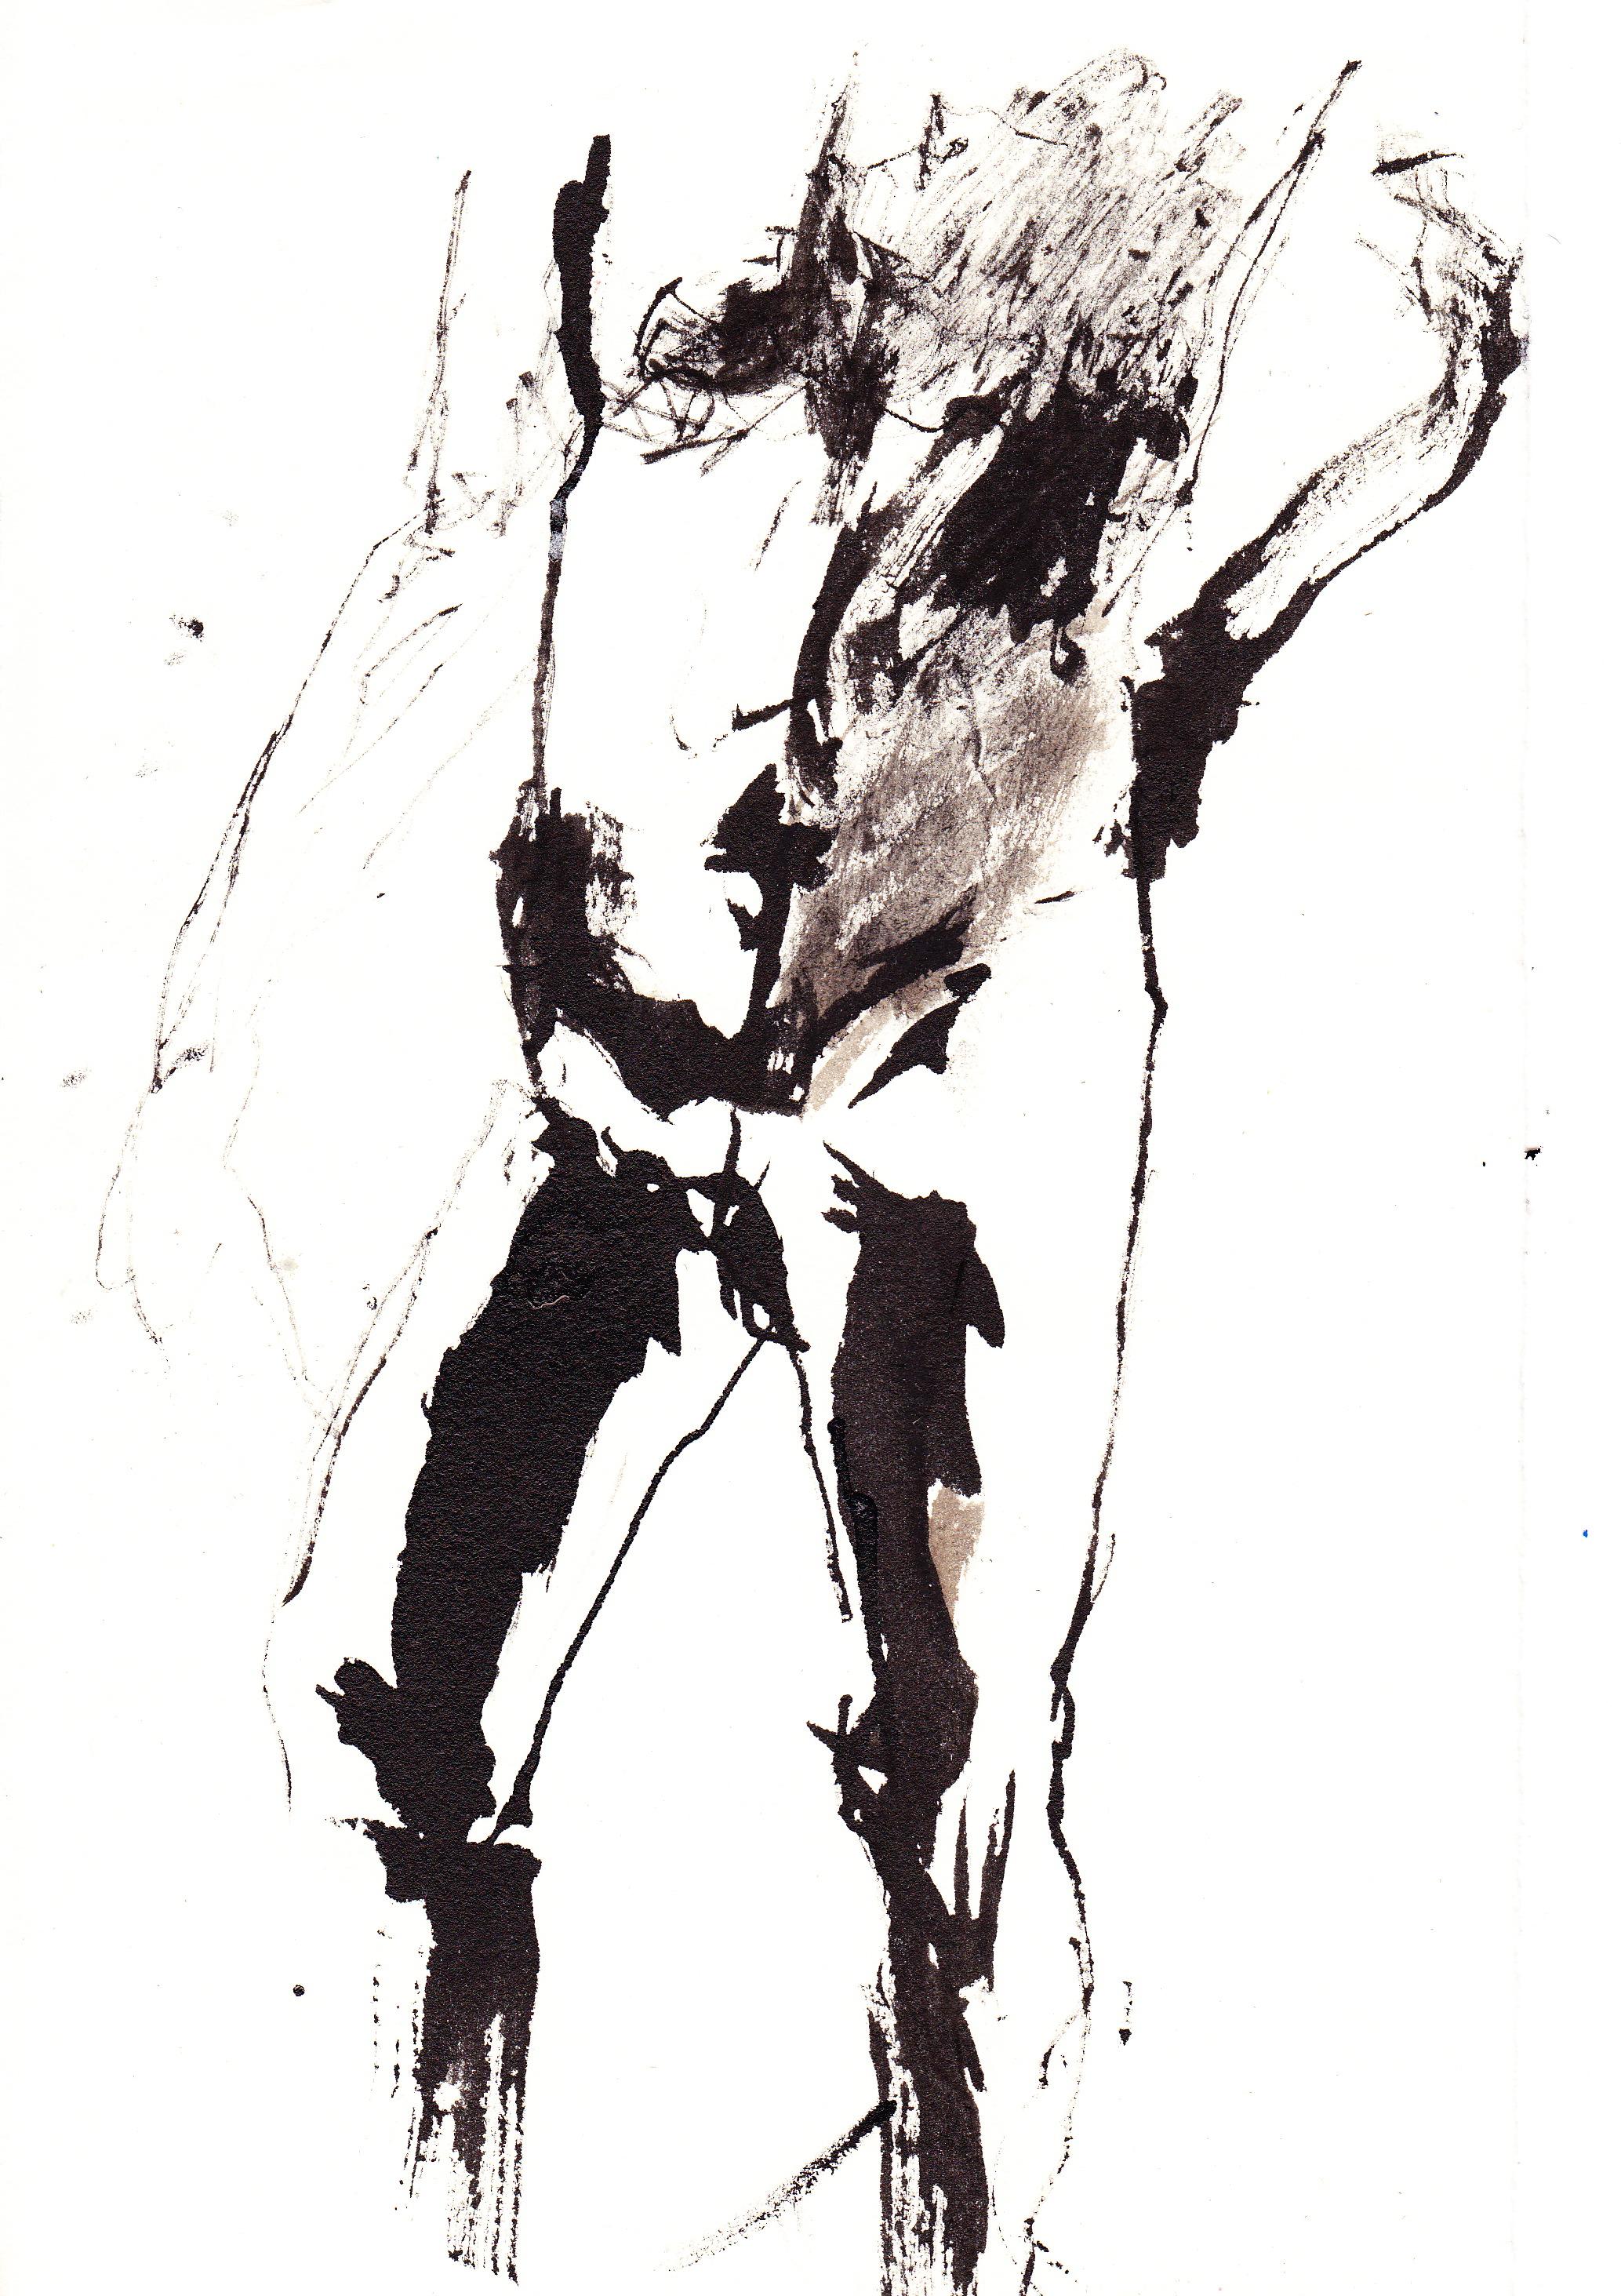 Art_0006.jpg